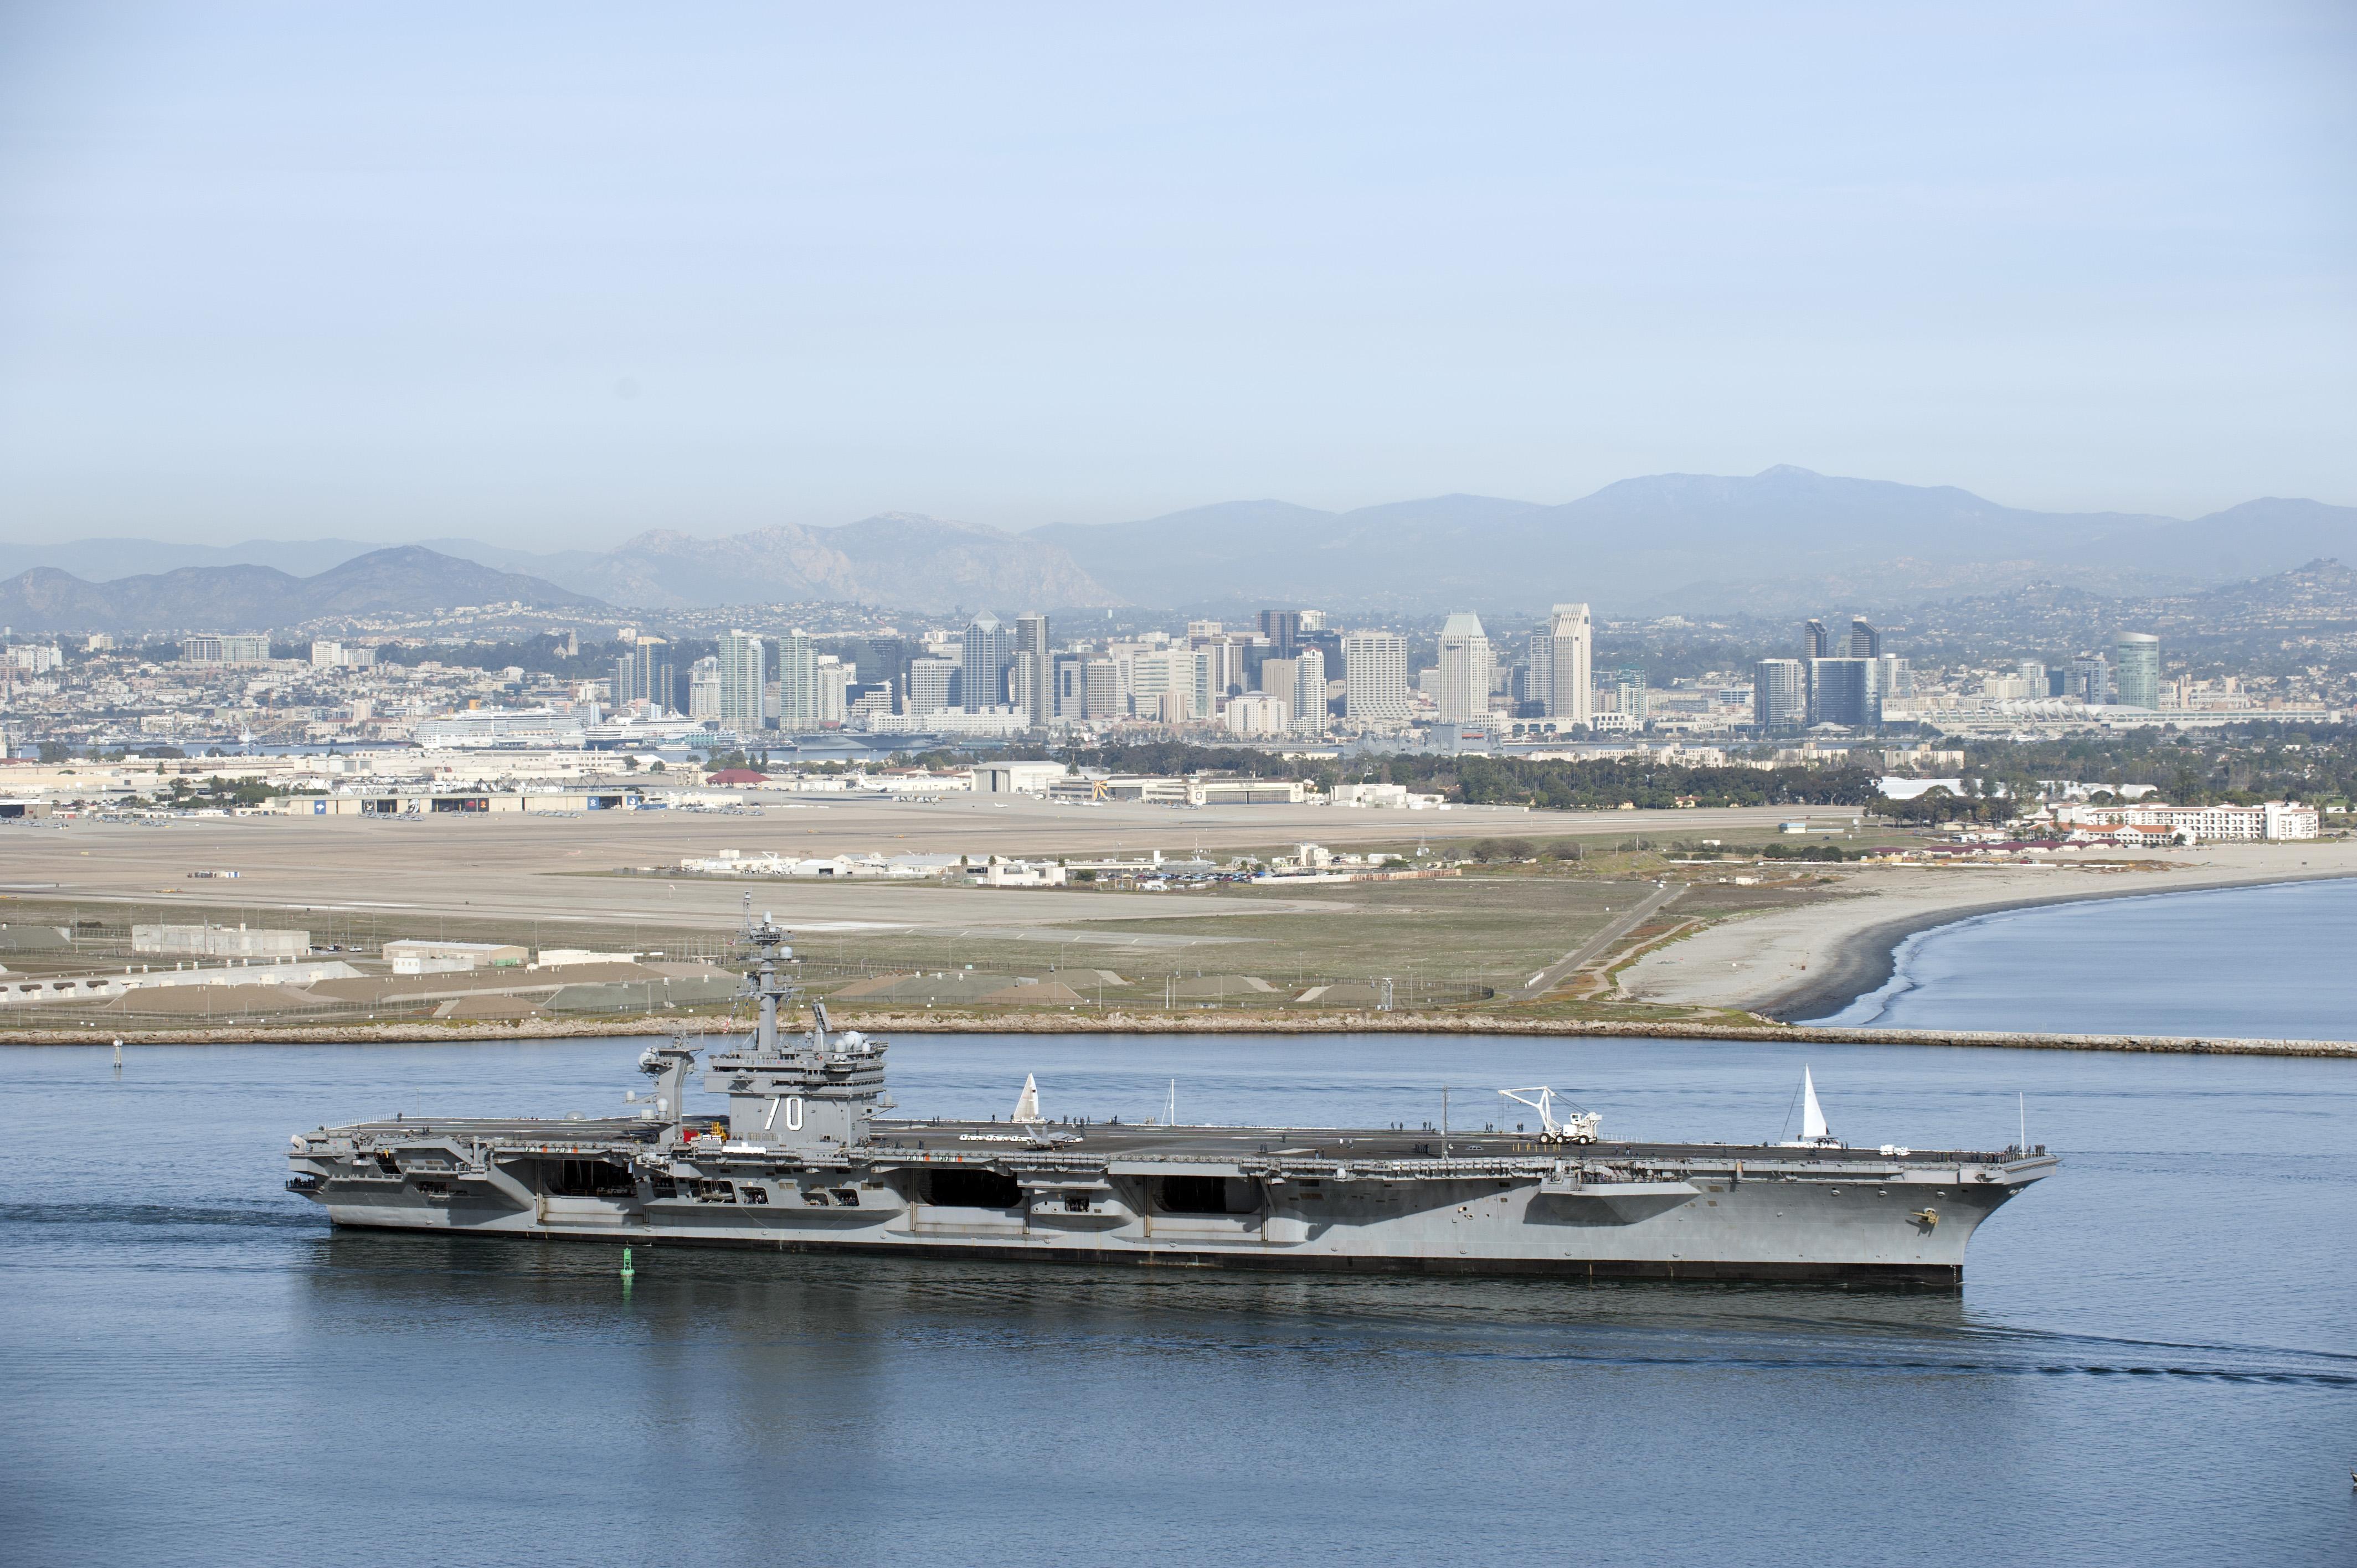 USS CARL VINSON CVN-70 am 01.02.2013 Bild: U.S. Navy